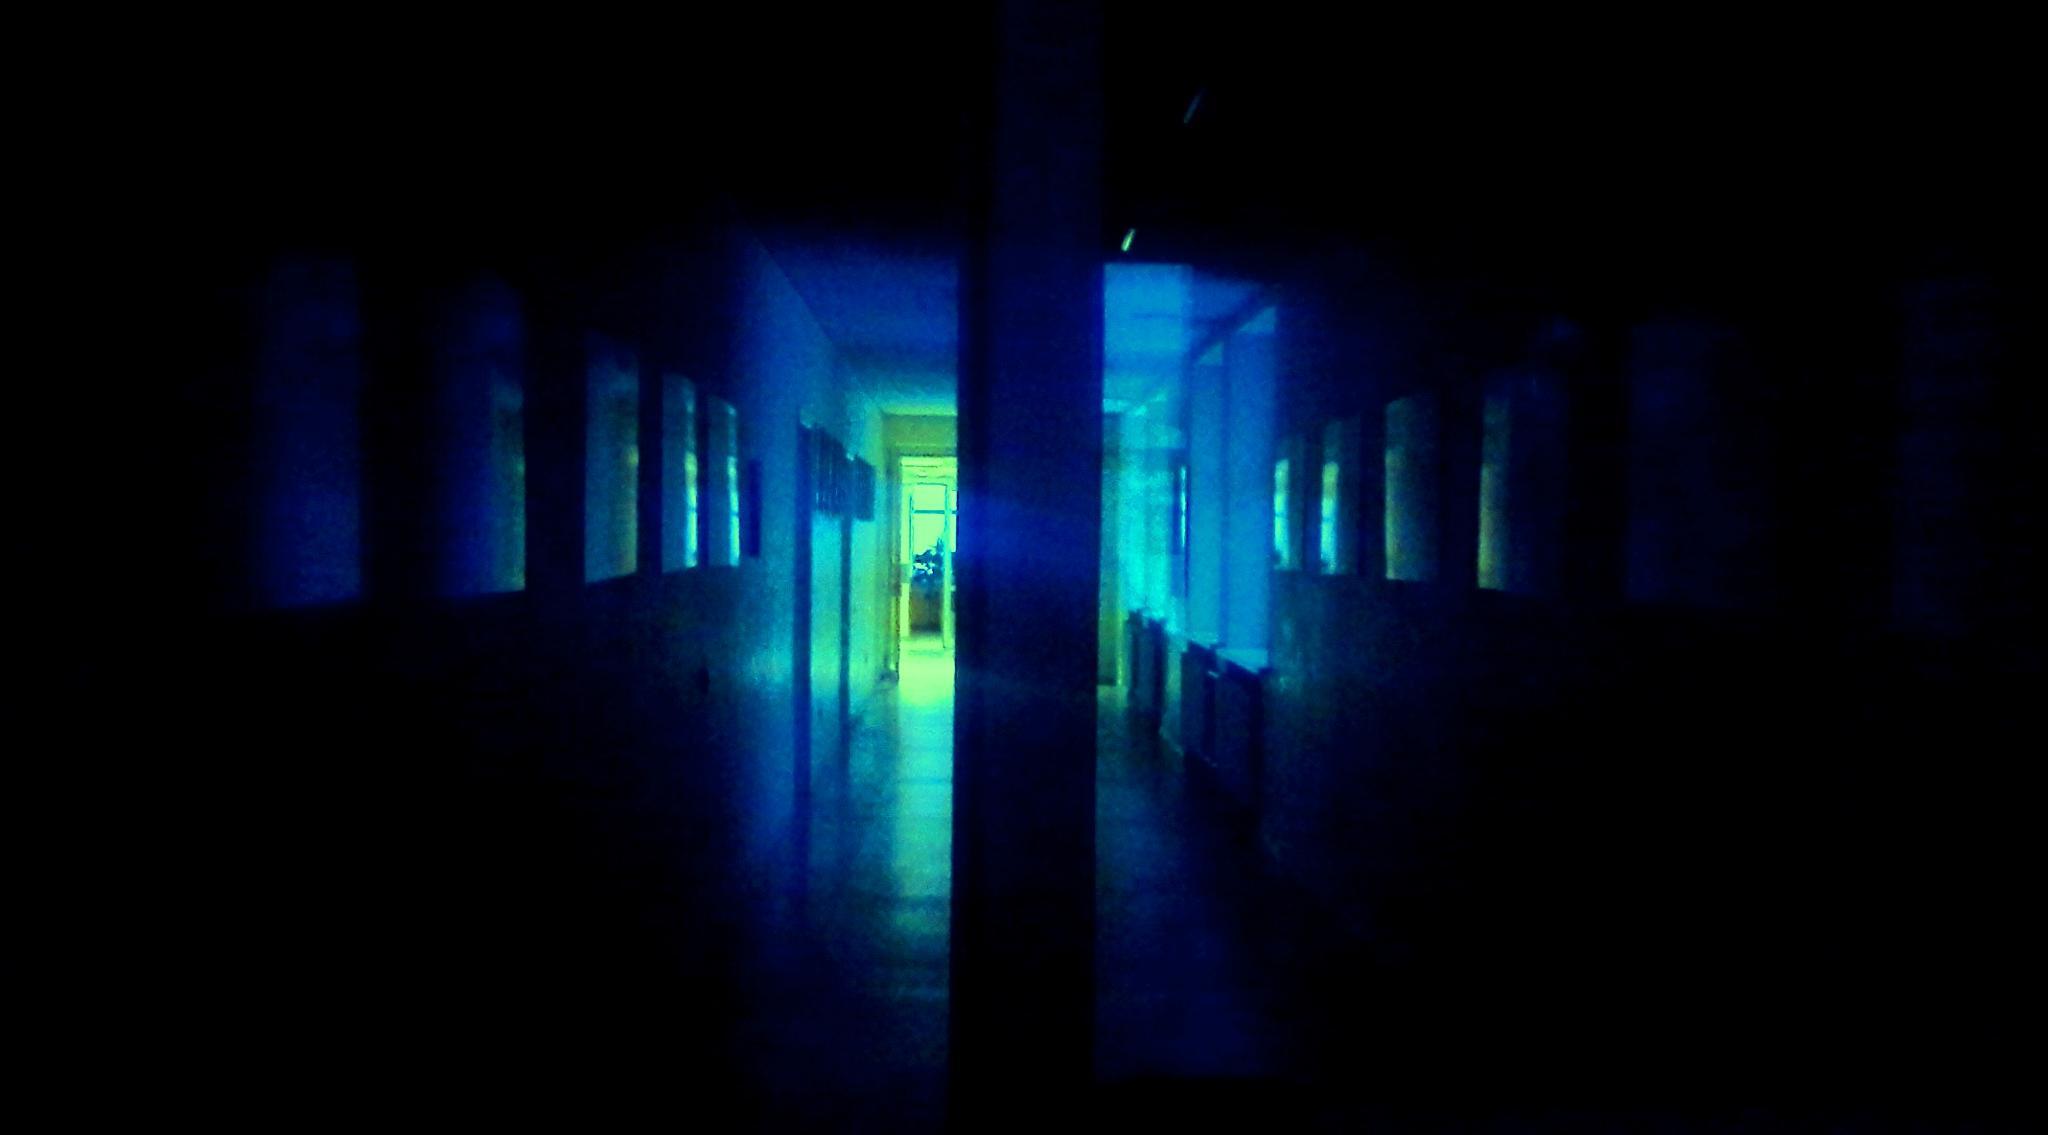 Through the Darkness by Simona Bakševičiūtė